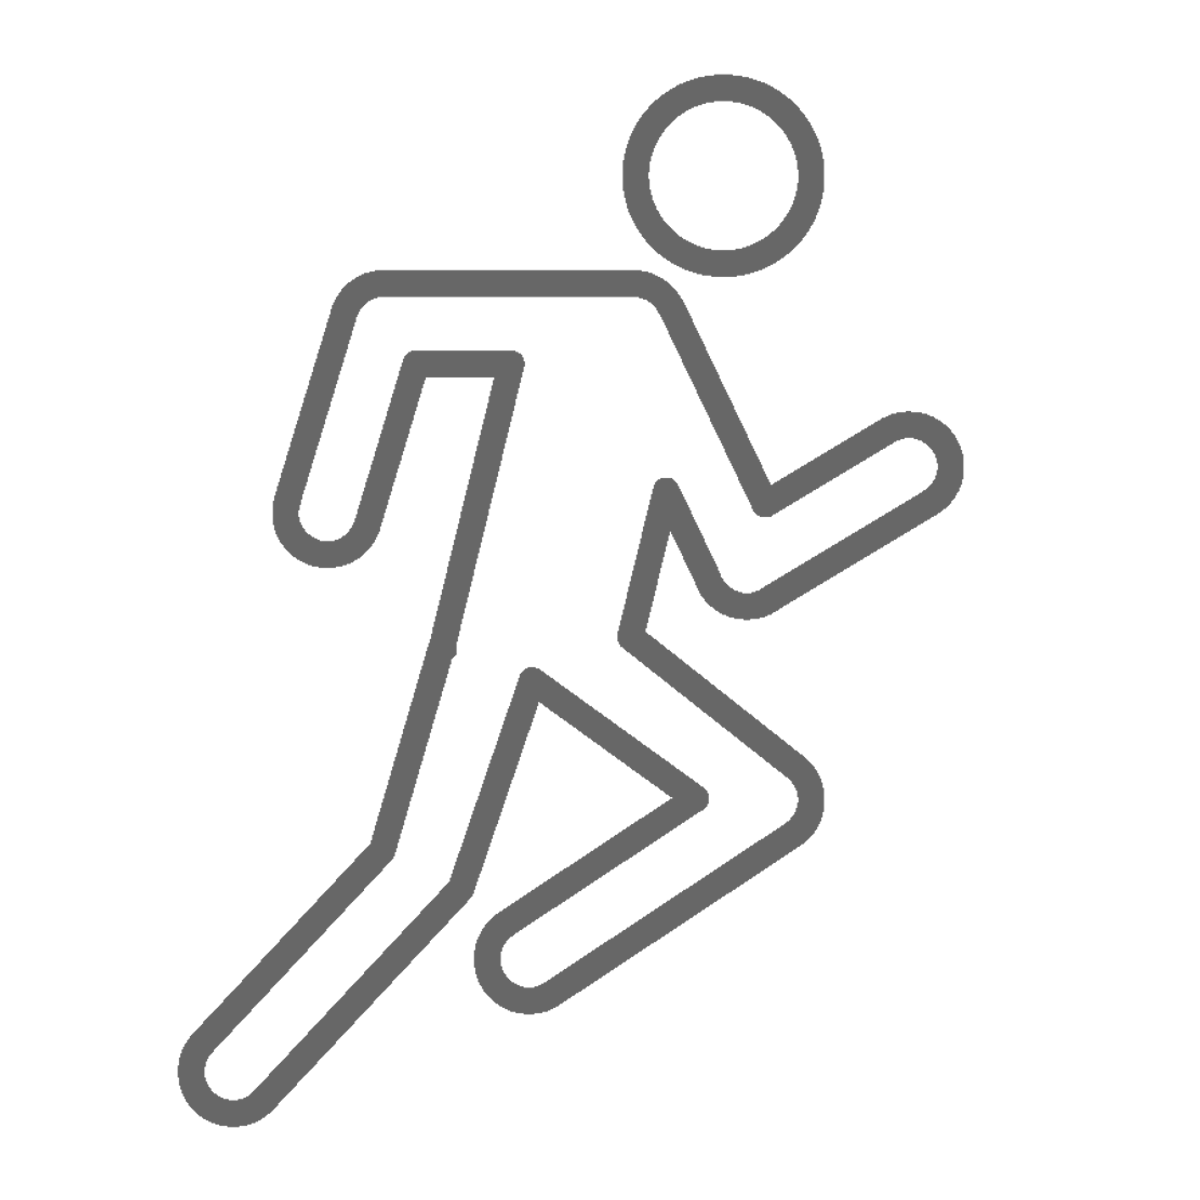 Clipart exercise line art. Choose a wellness challenge